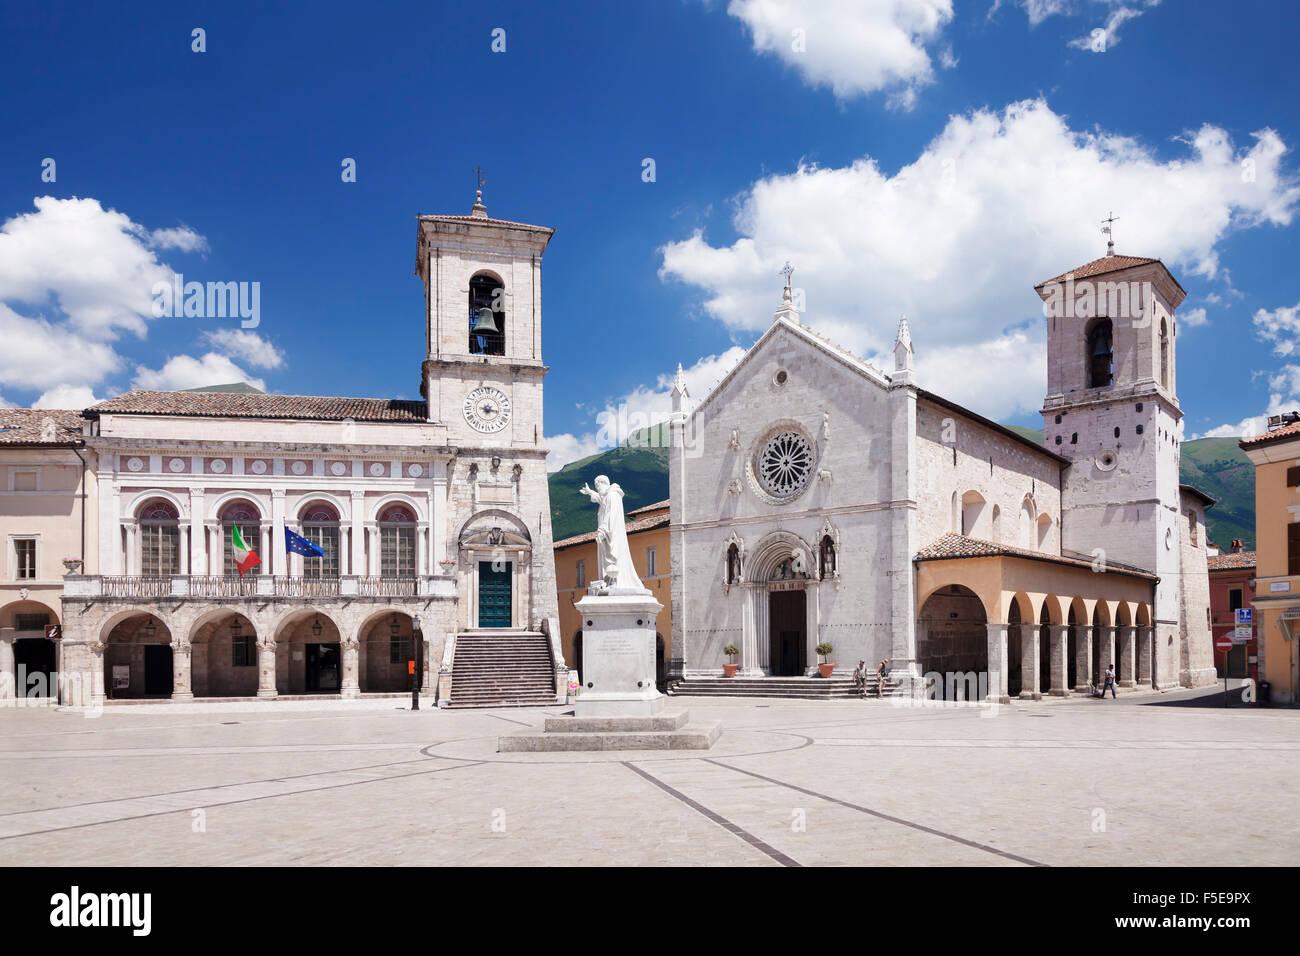 Piazza San Benedetto Square, Norcia, Monti Sibillini National Park, Perugia District, Umbria, Italy, Europe - Stock Image